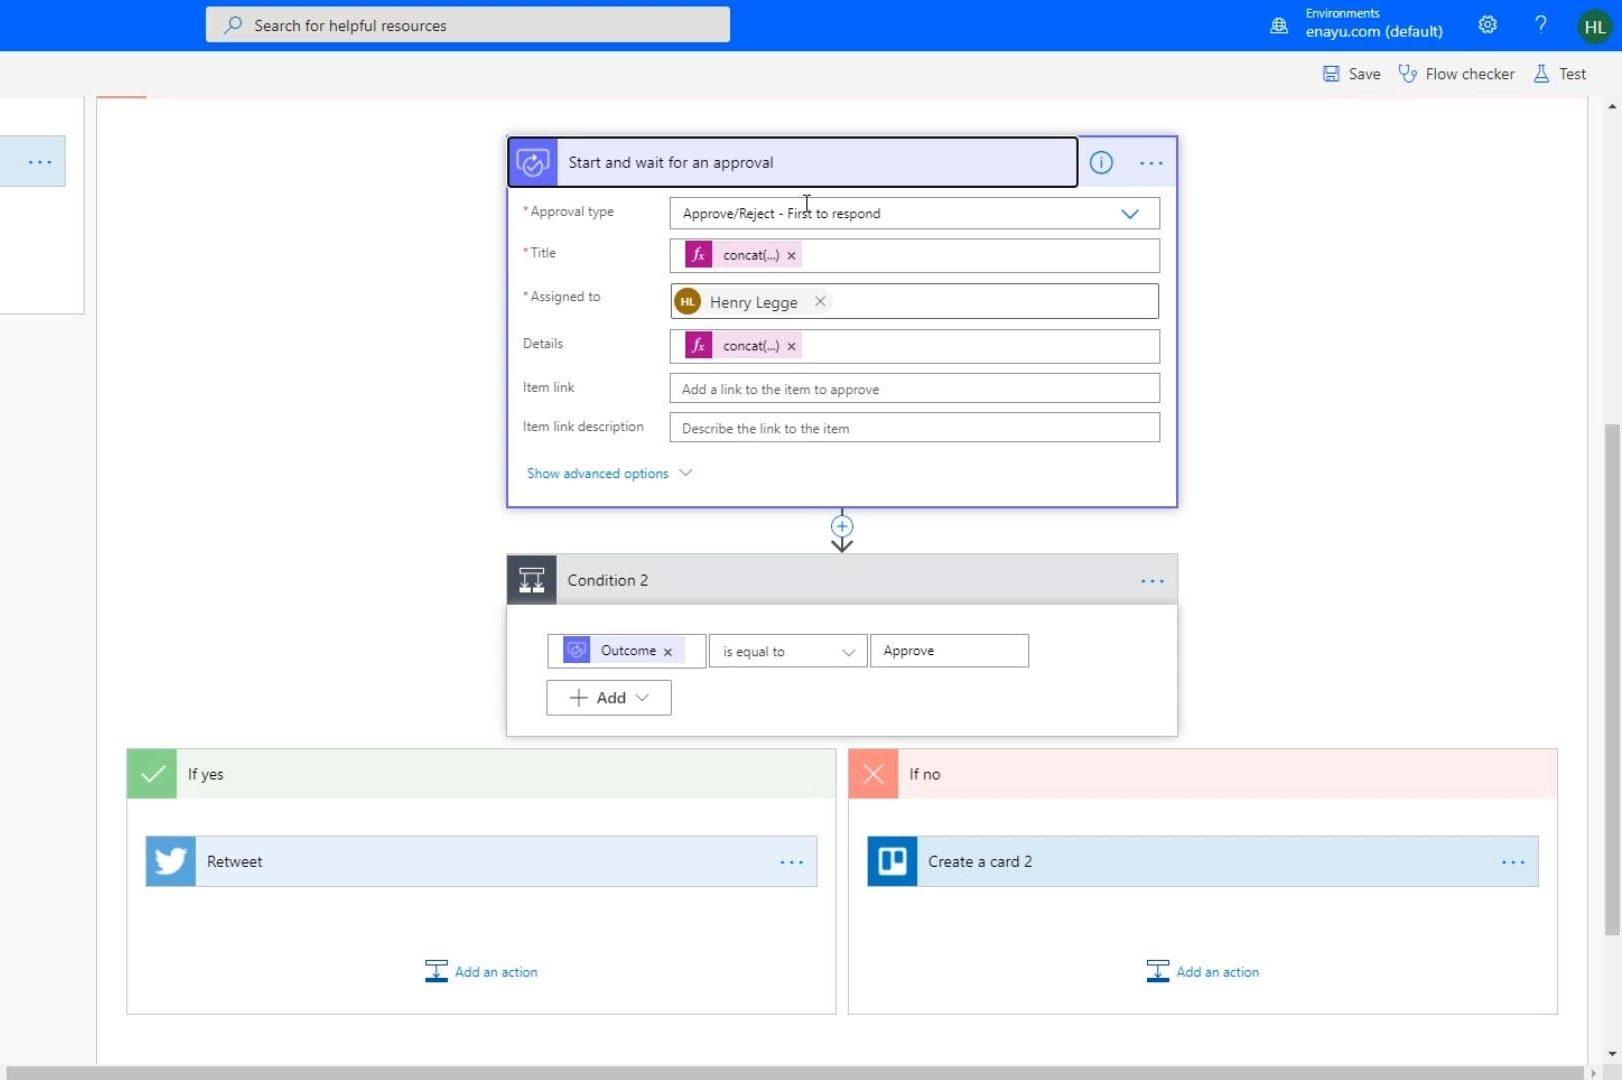 Microsoft flow Approval